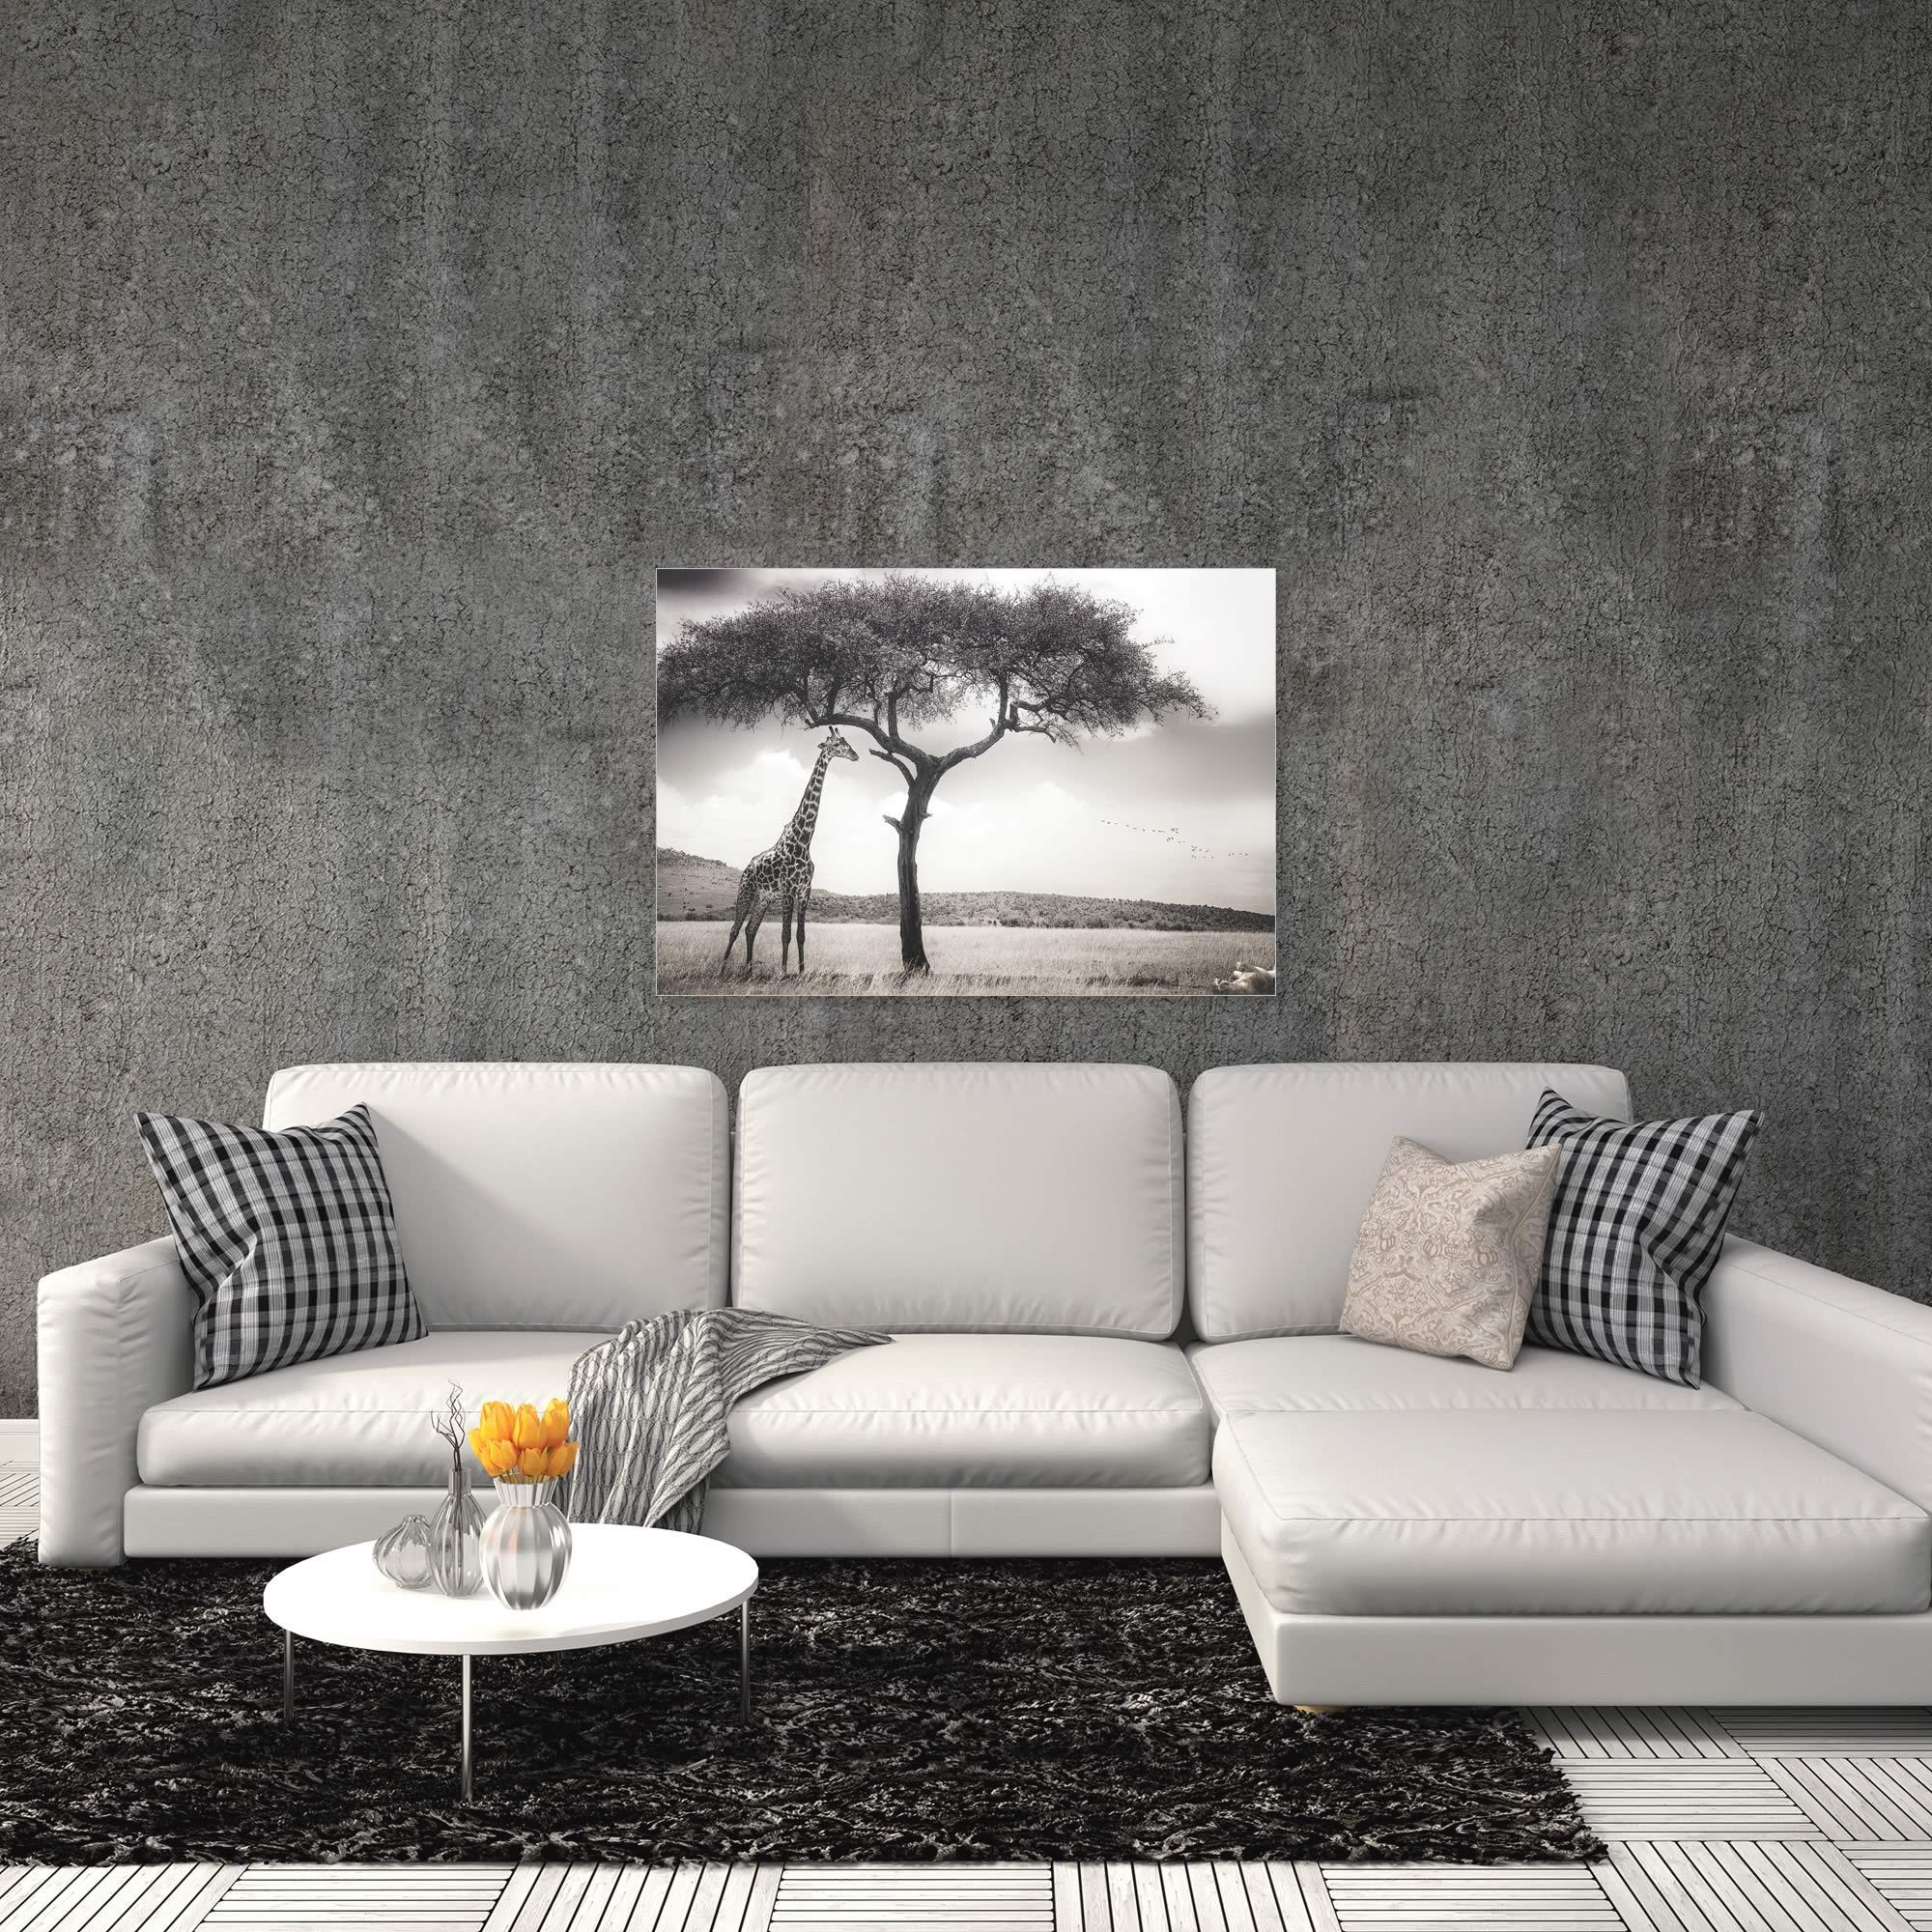 Under the African Sun by Piet Flour - Giraffe Wall Art on Metal or Acrylic - Alternate View 1